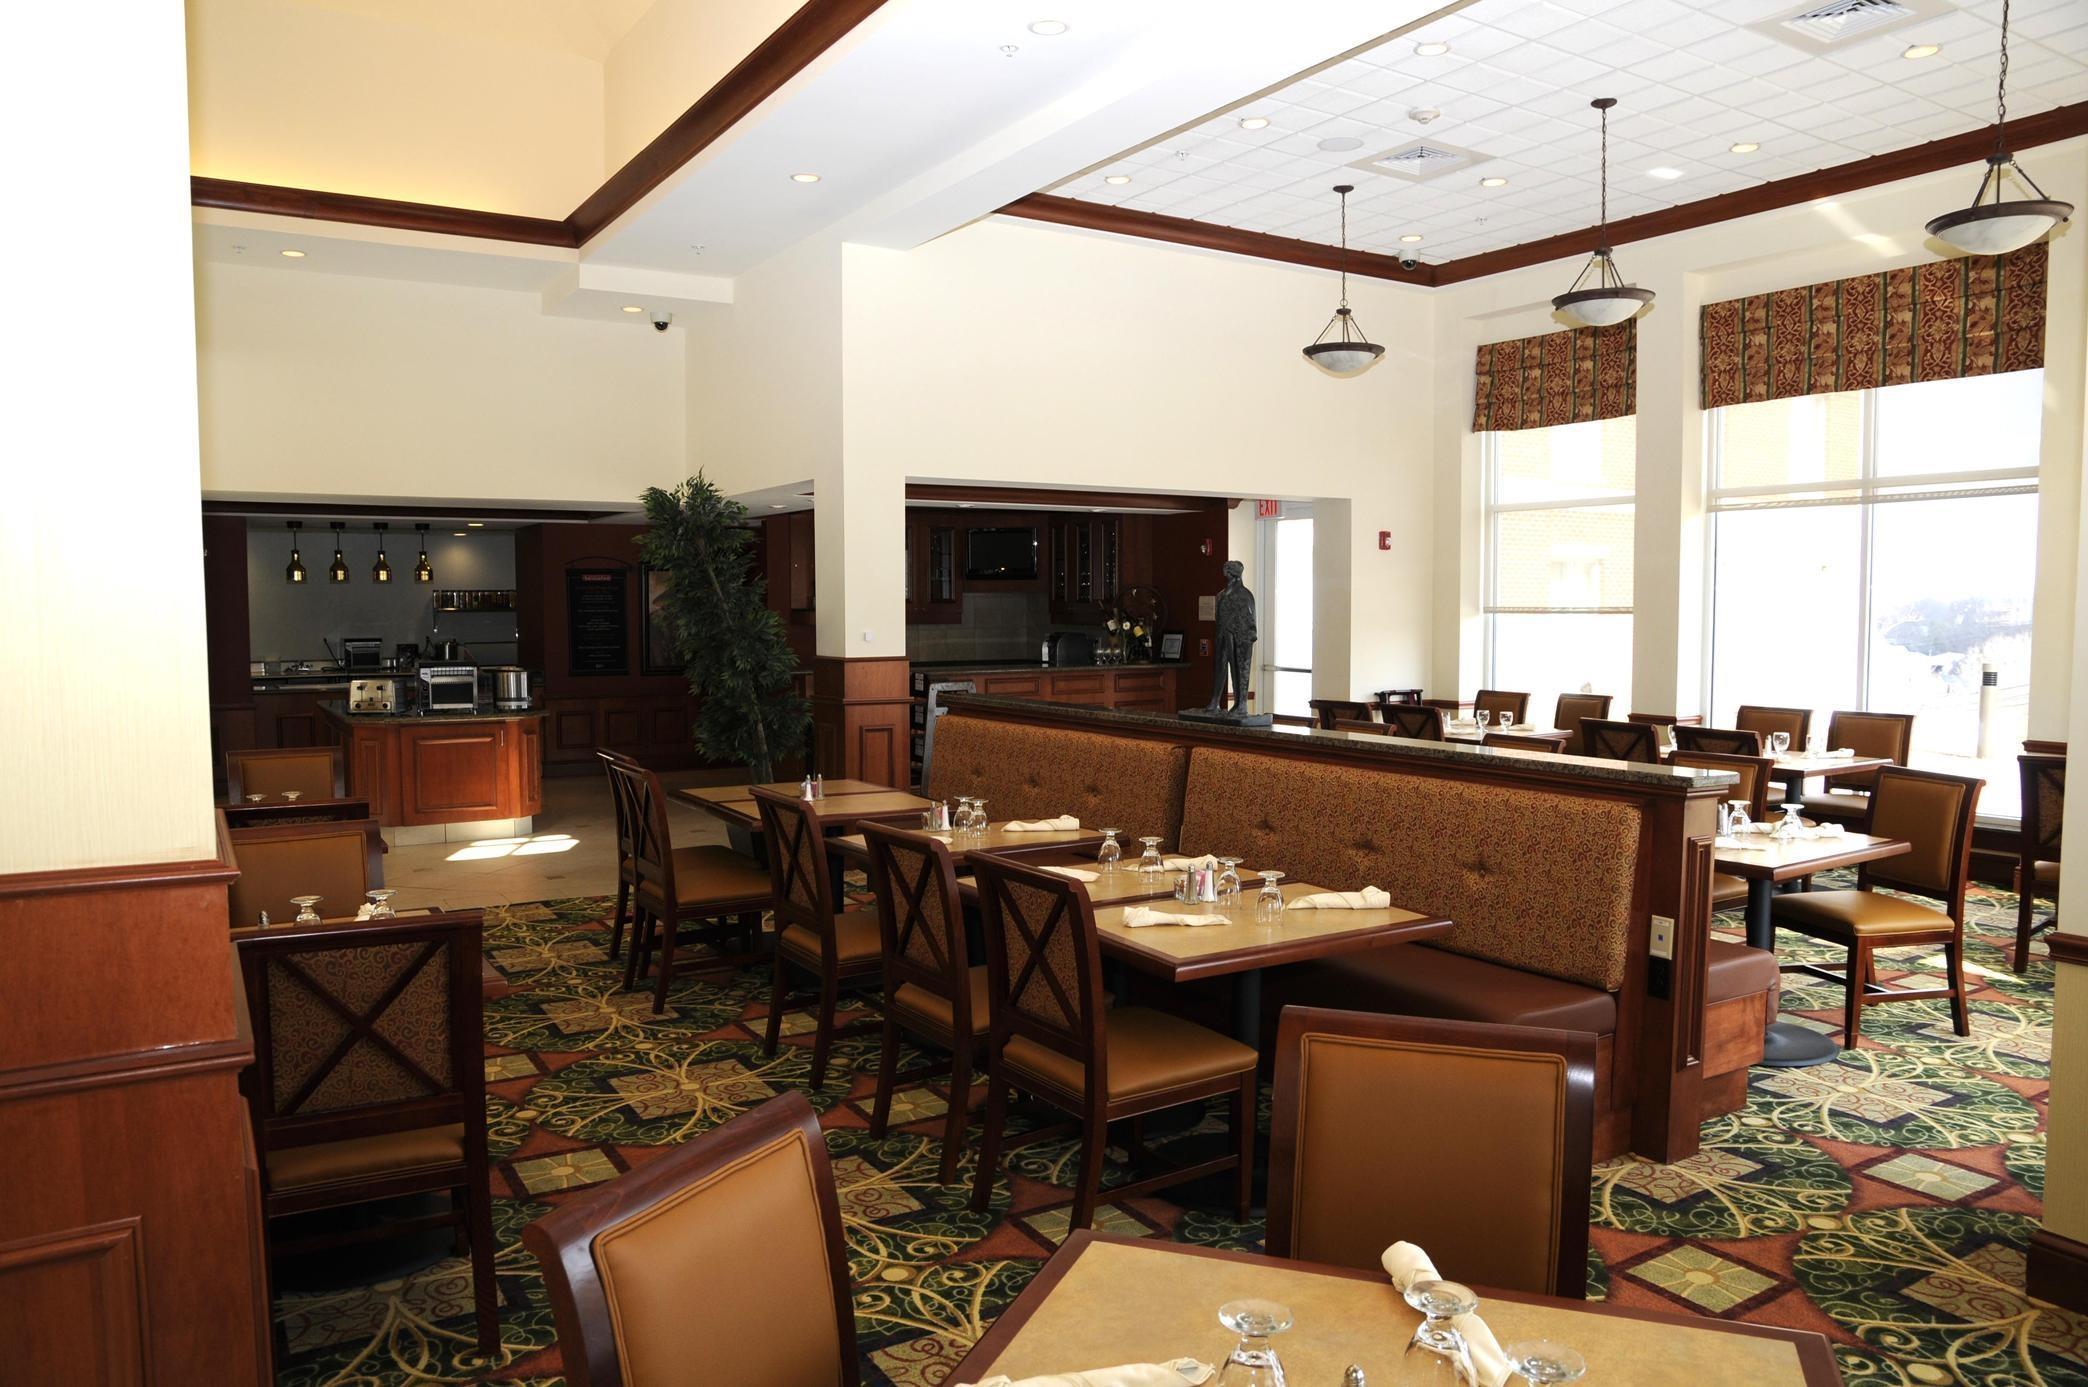 Hilton Garden Inn Mystic Groton At 224 Gold Star Highway Groton Ct On Fave